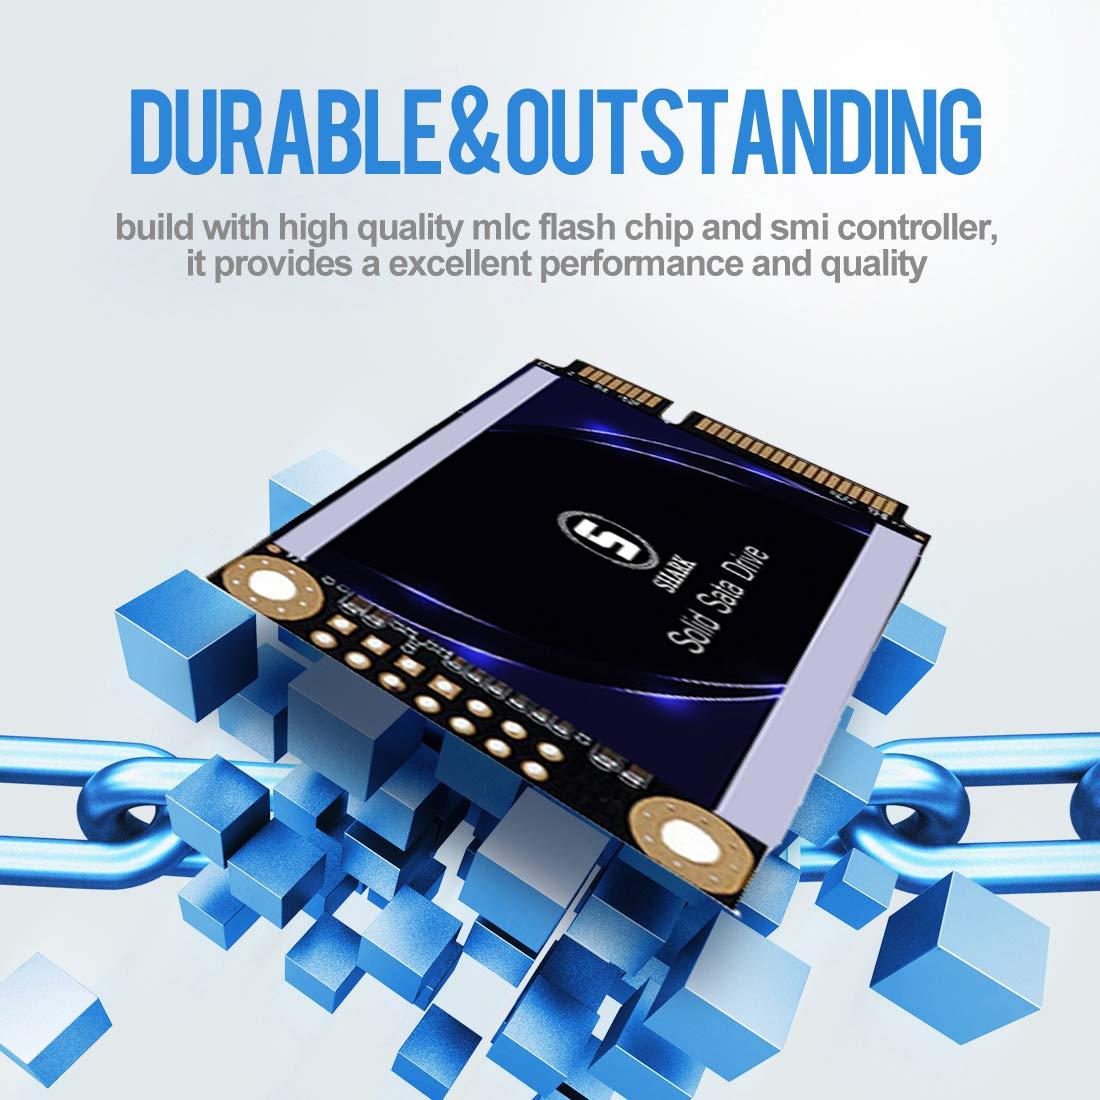 new style ff1b6 38b9f SSD M.2 2242 60GB Ngff Shark Unidad De Estado Só lido Incorporada